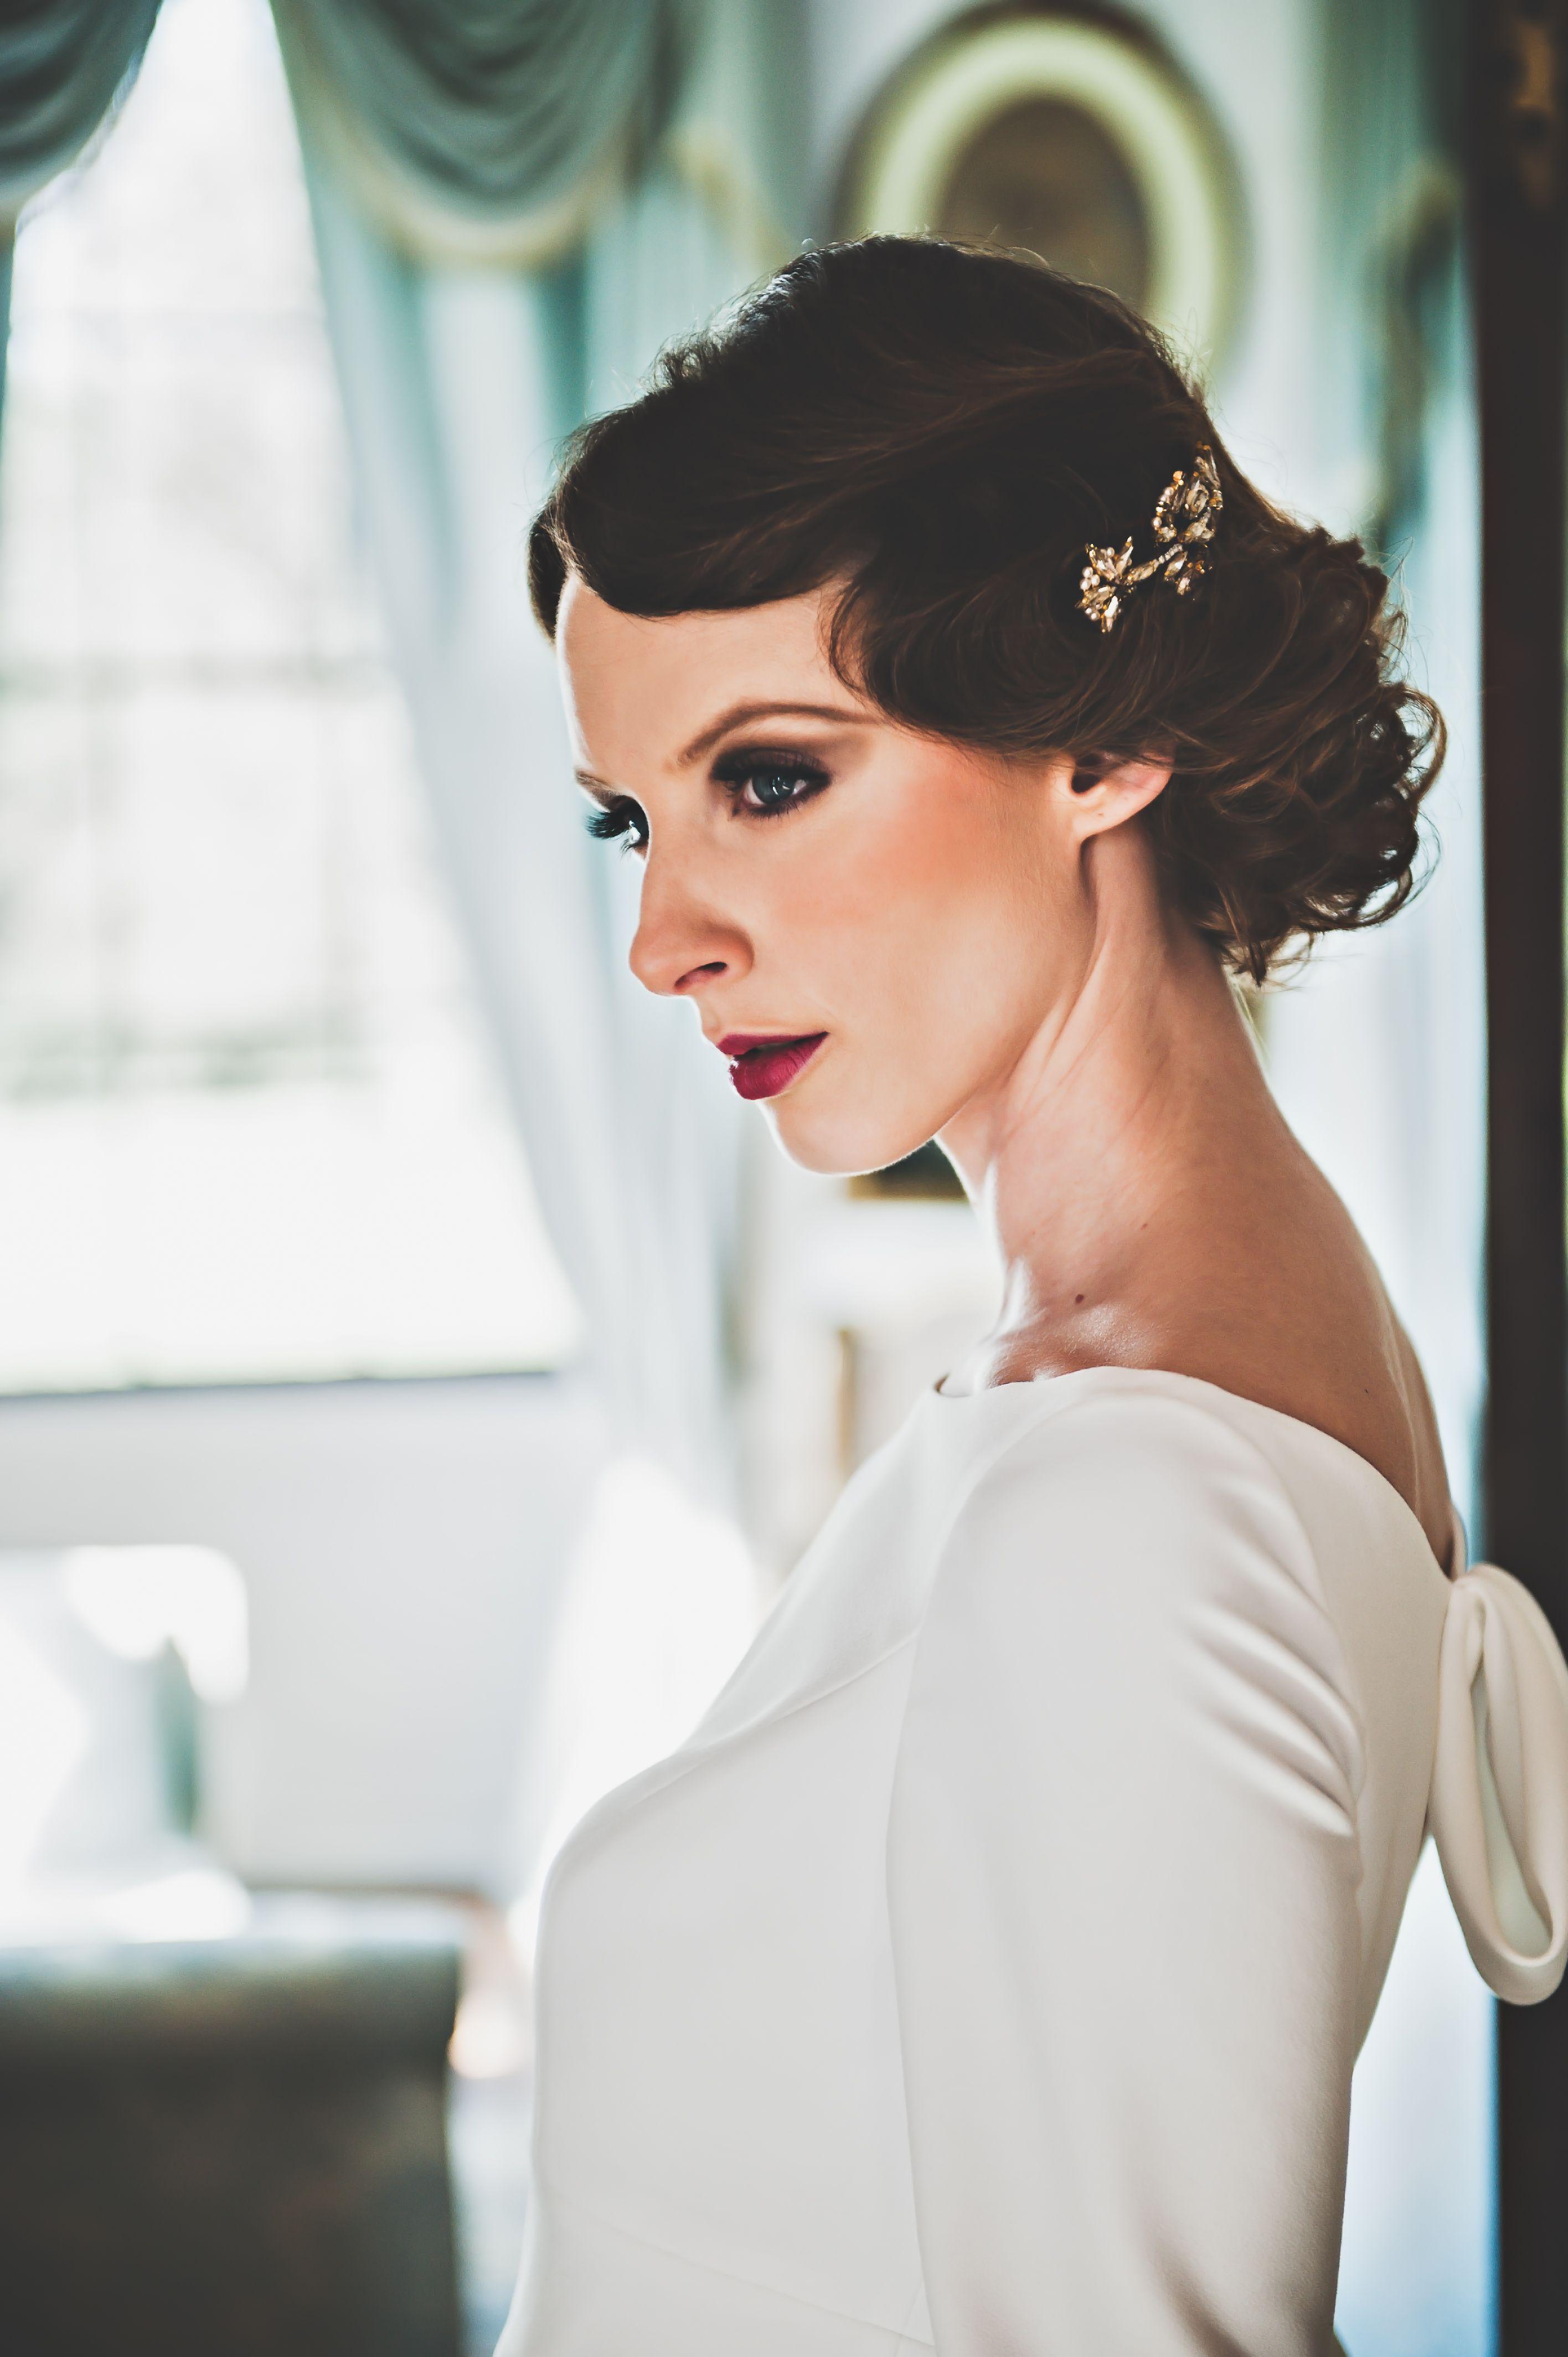 1930\'s bride makeup design by me - Image ikonworks | Editorial ...